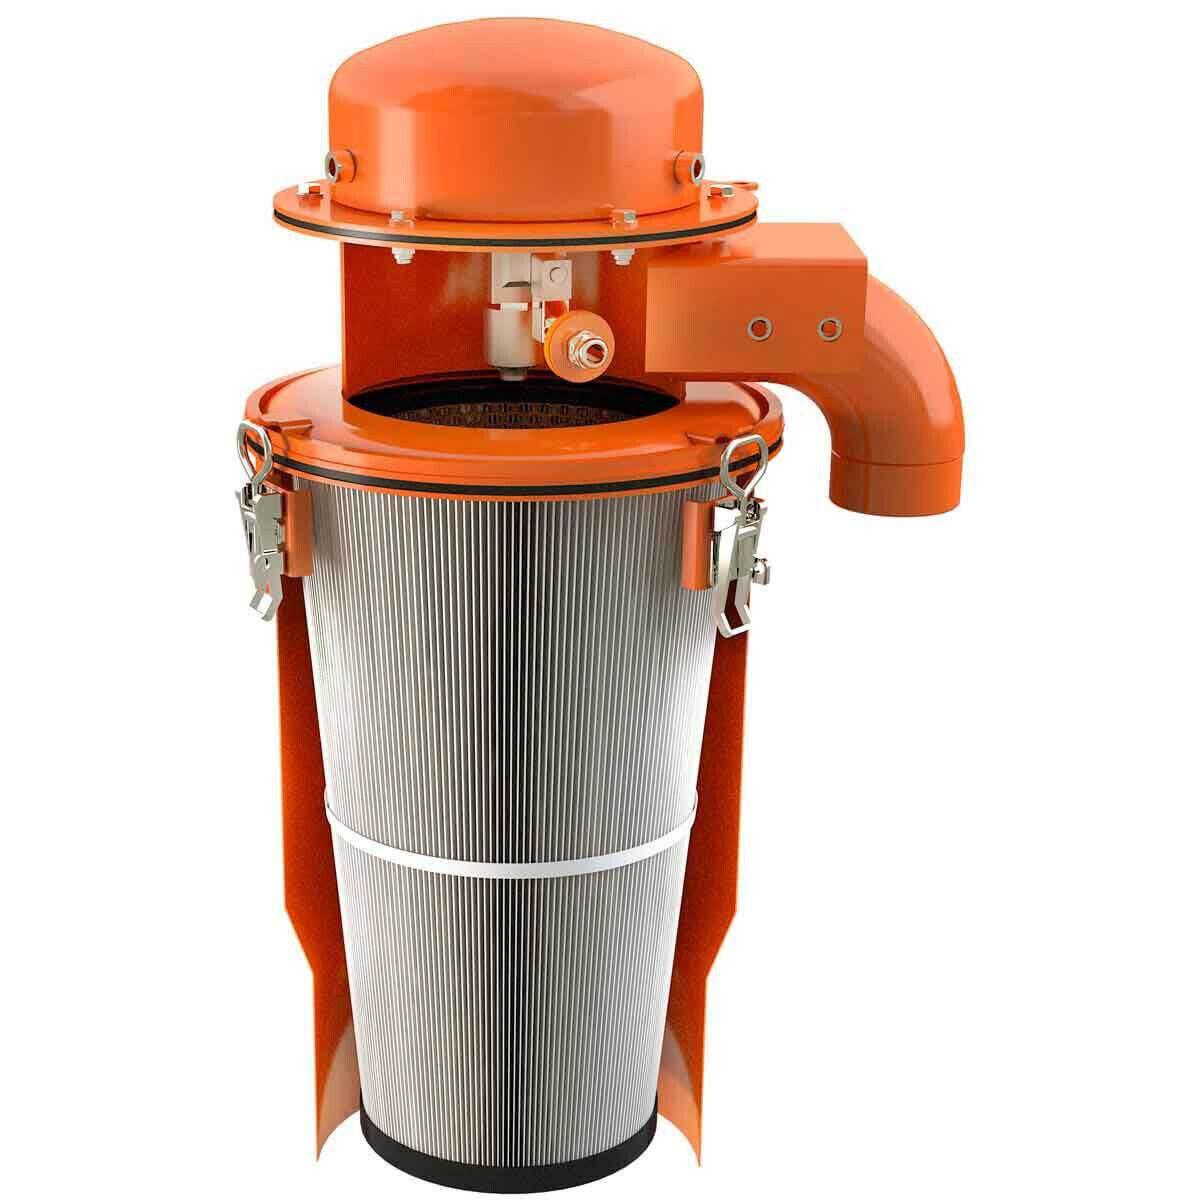 Husqvarna DC6000 HEPA Filter